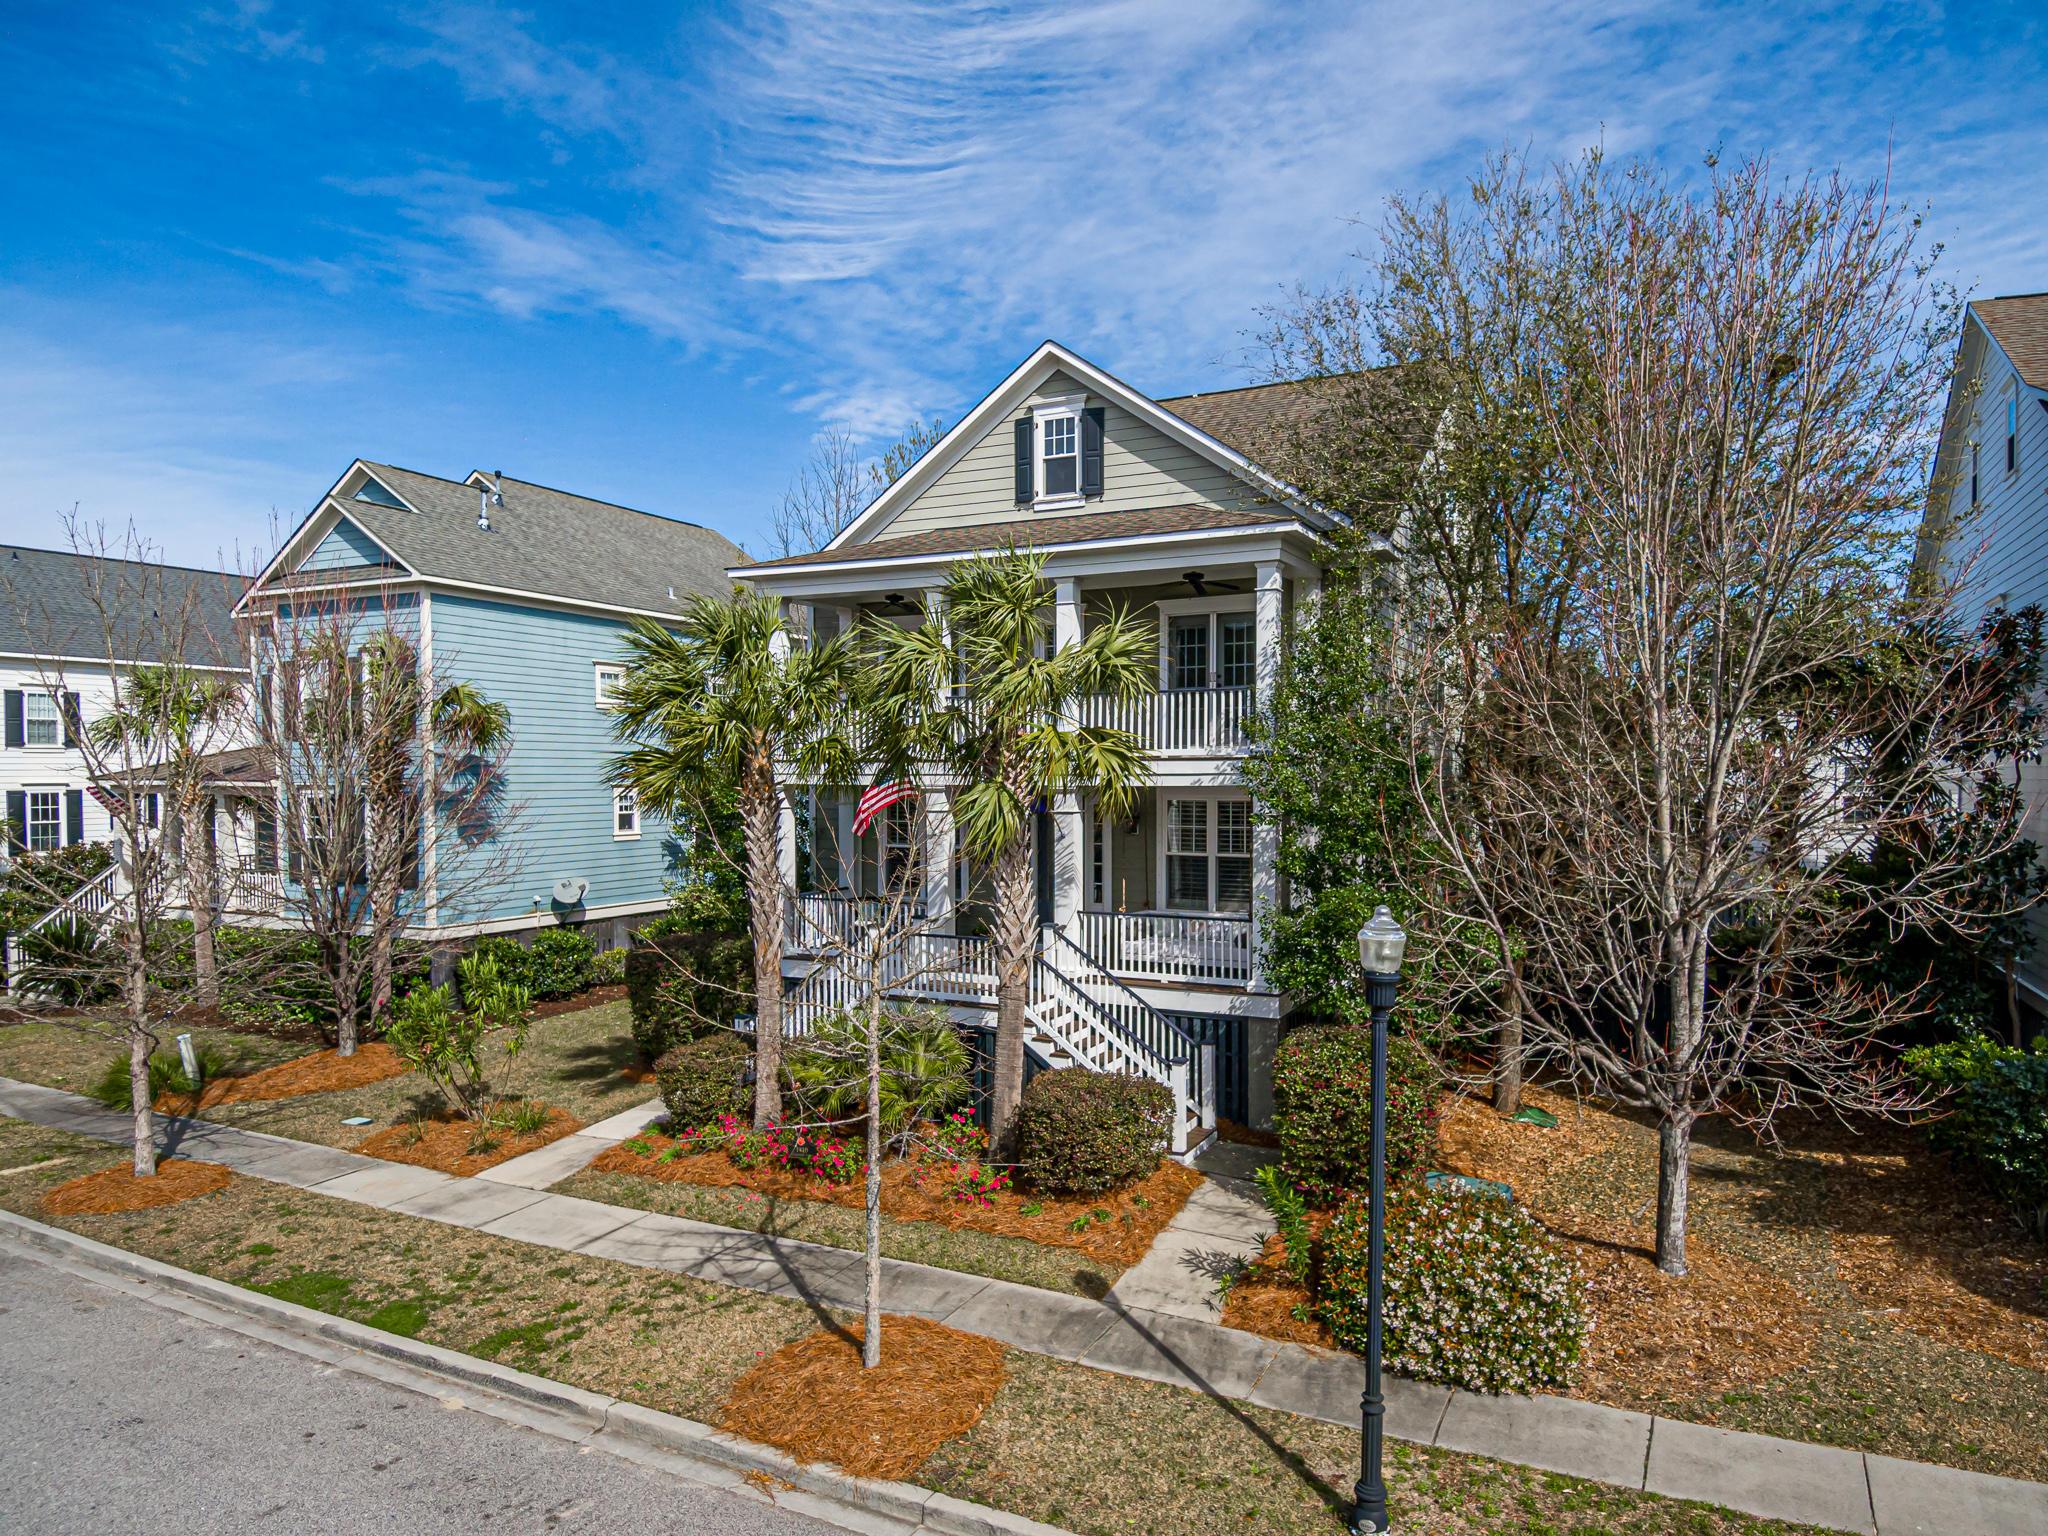 Daniel Island Smythe Park Homes For Sale - 1410 Wando View, Charleston, SC - 25